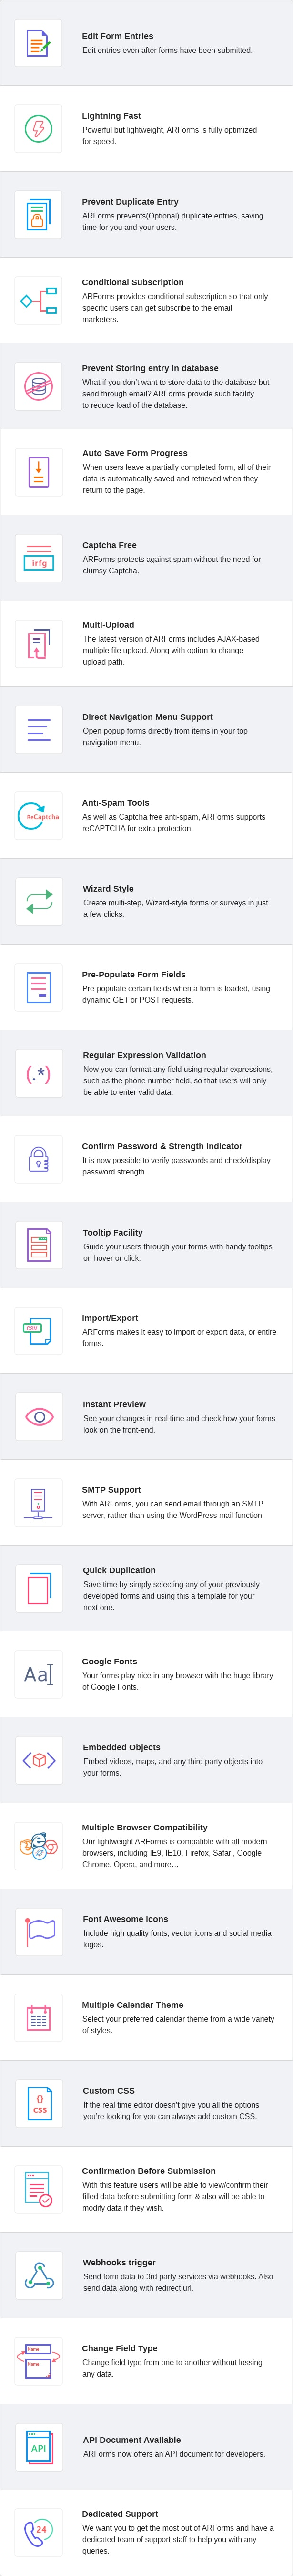 ARForms: WordPress Form Builder Plugin - 50